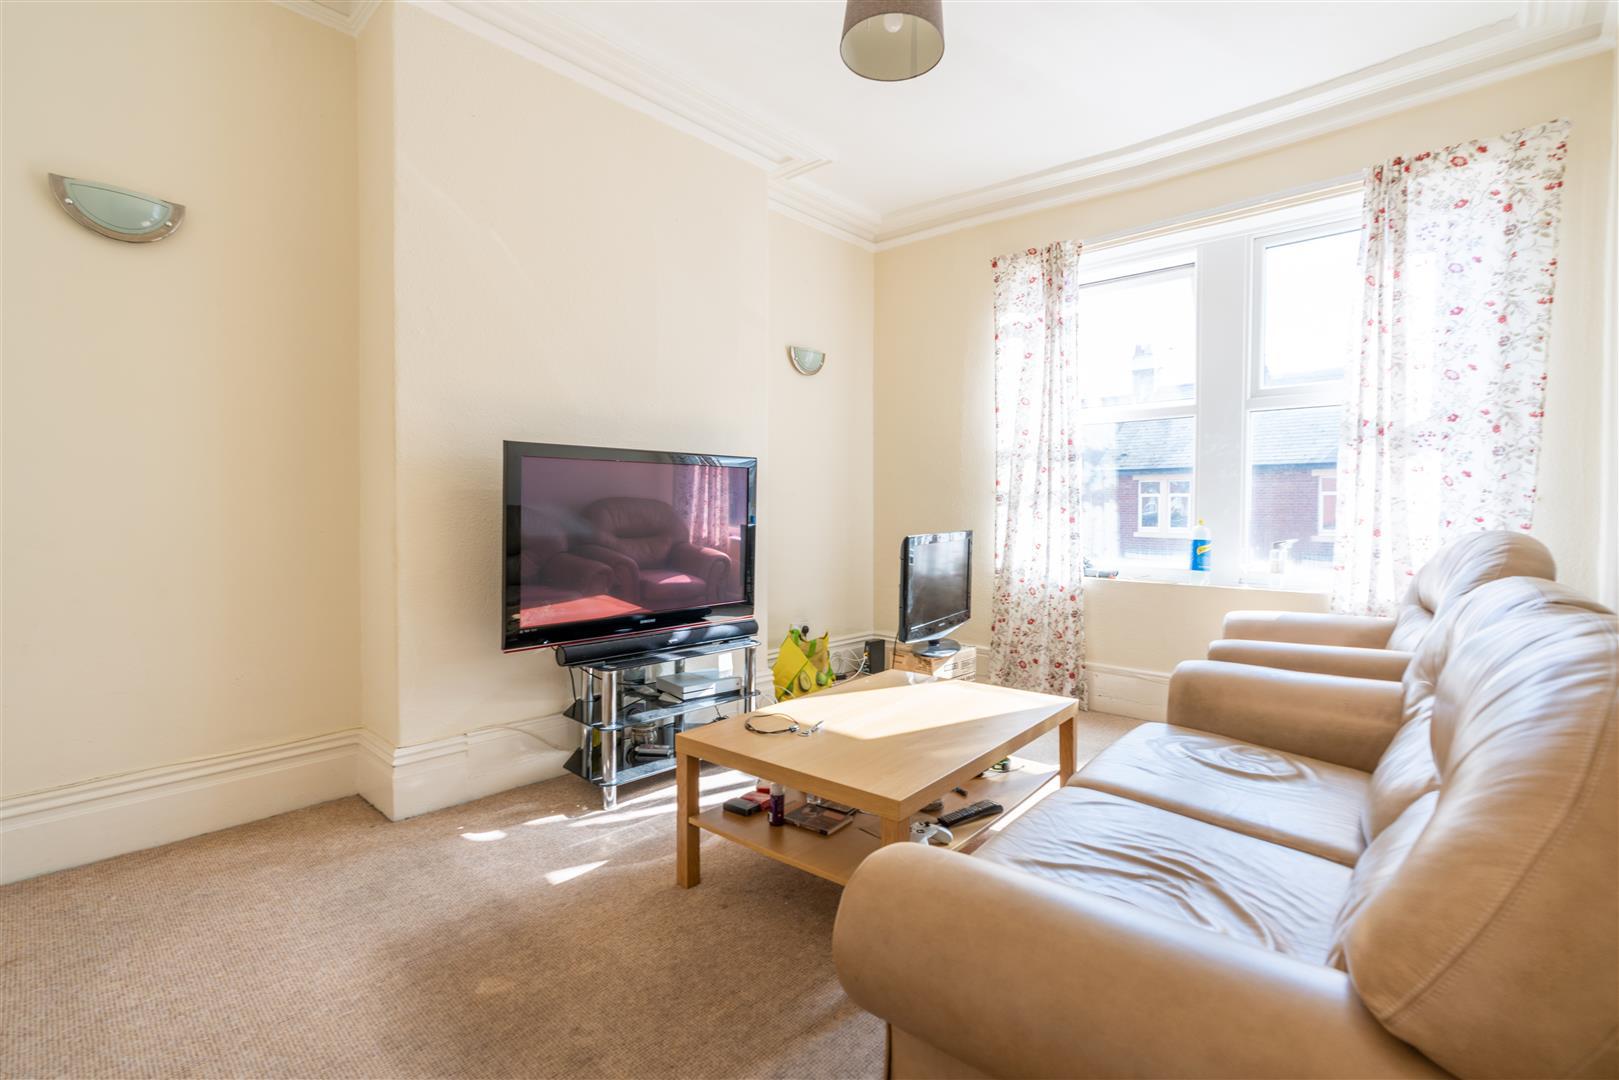 3 bed maisonette to rent in Rothbury Terrace, Heaton, NE6